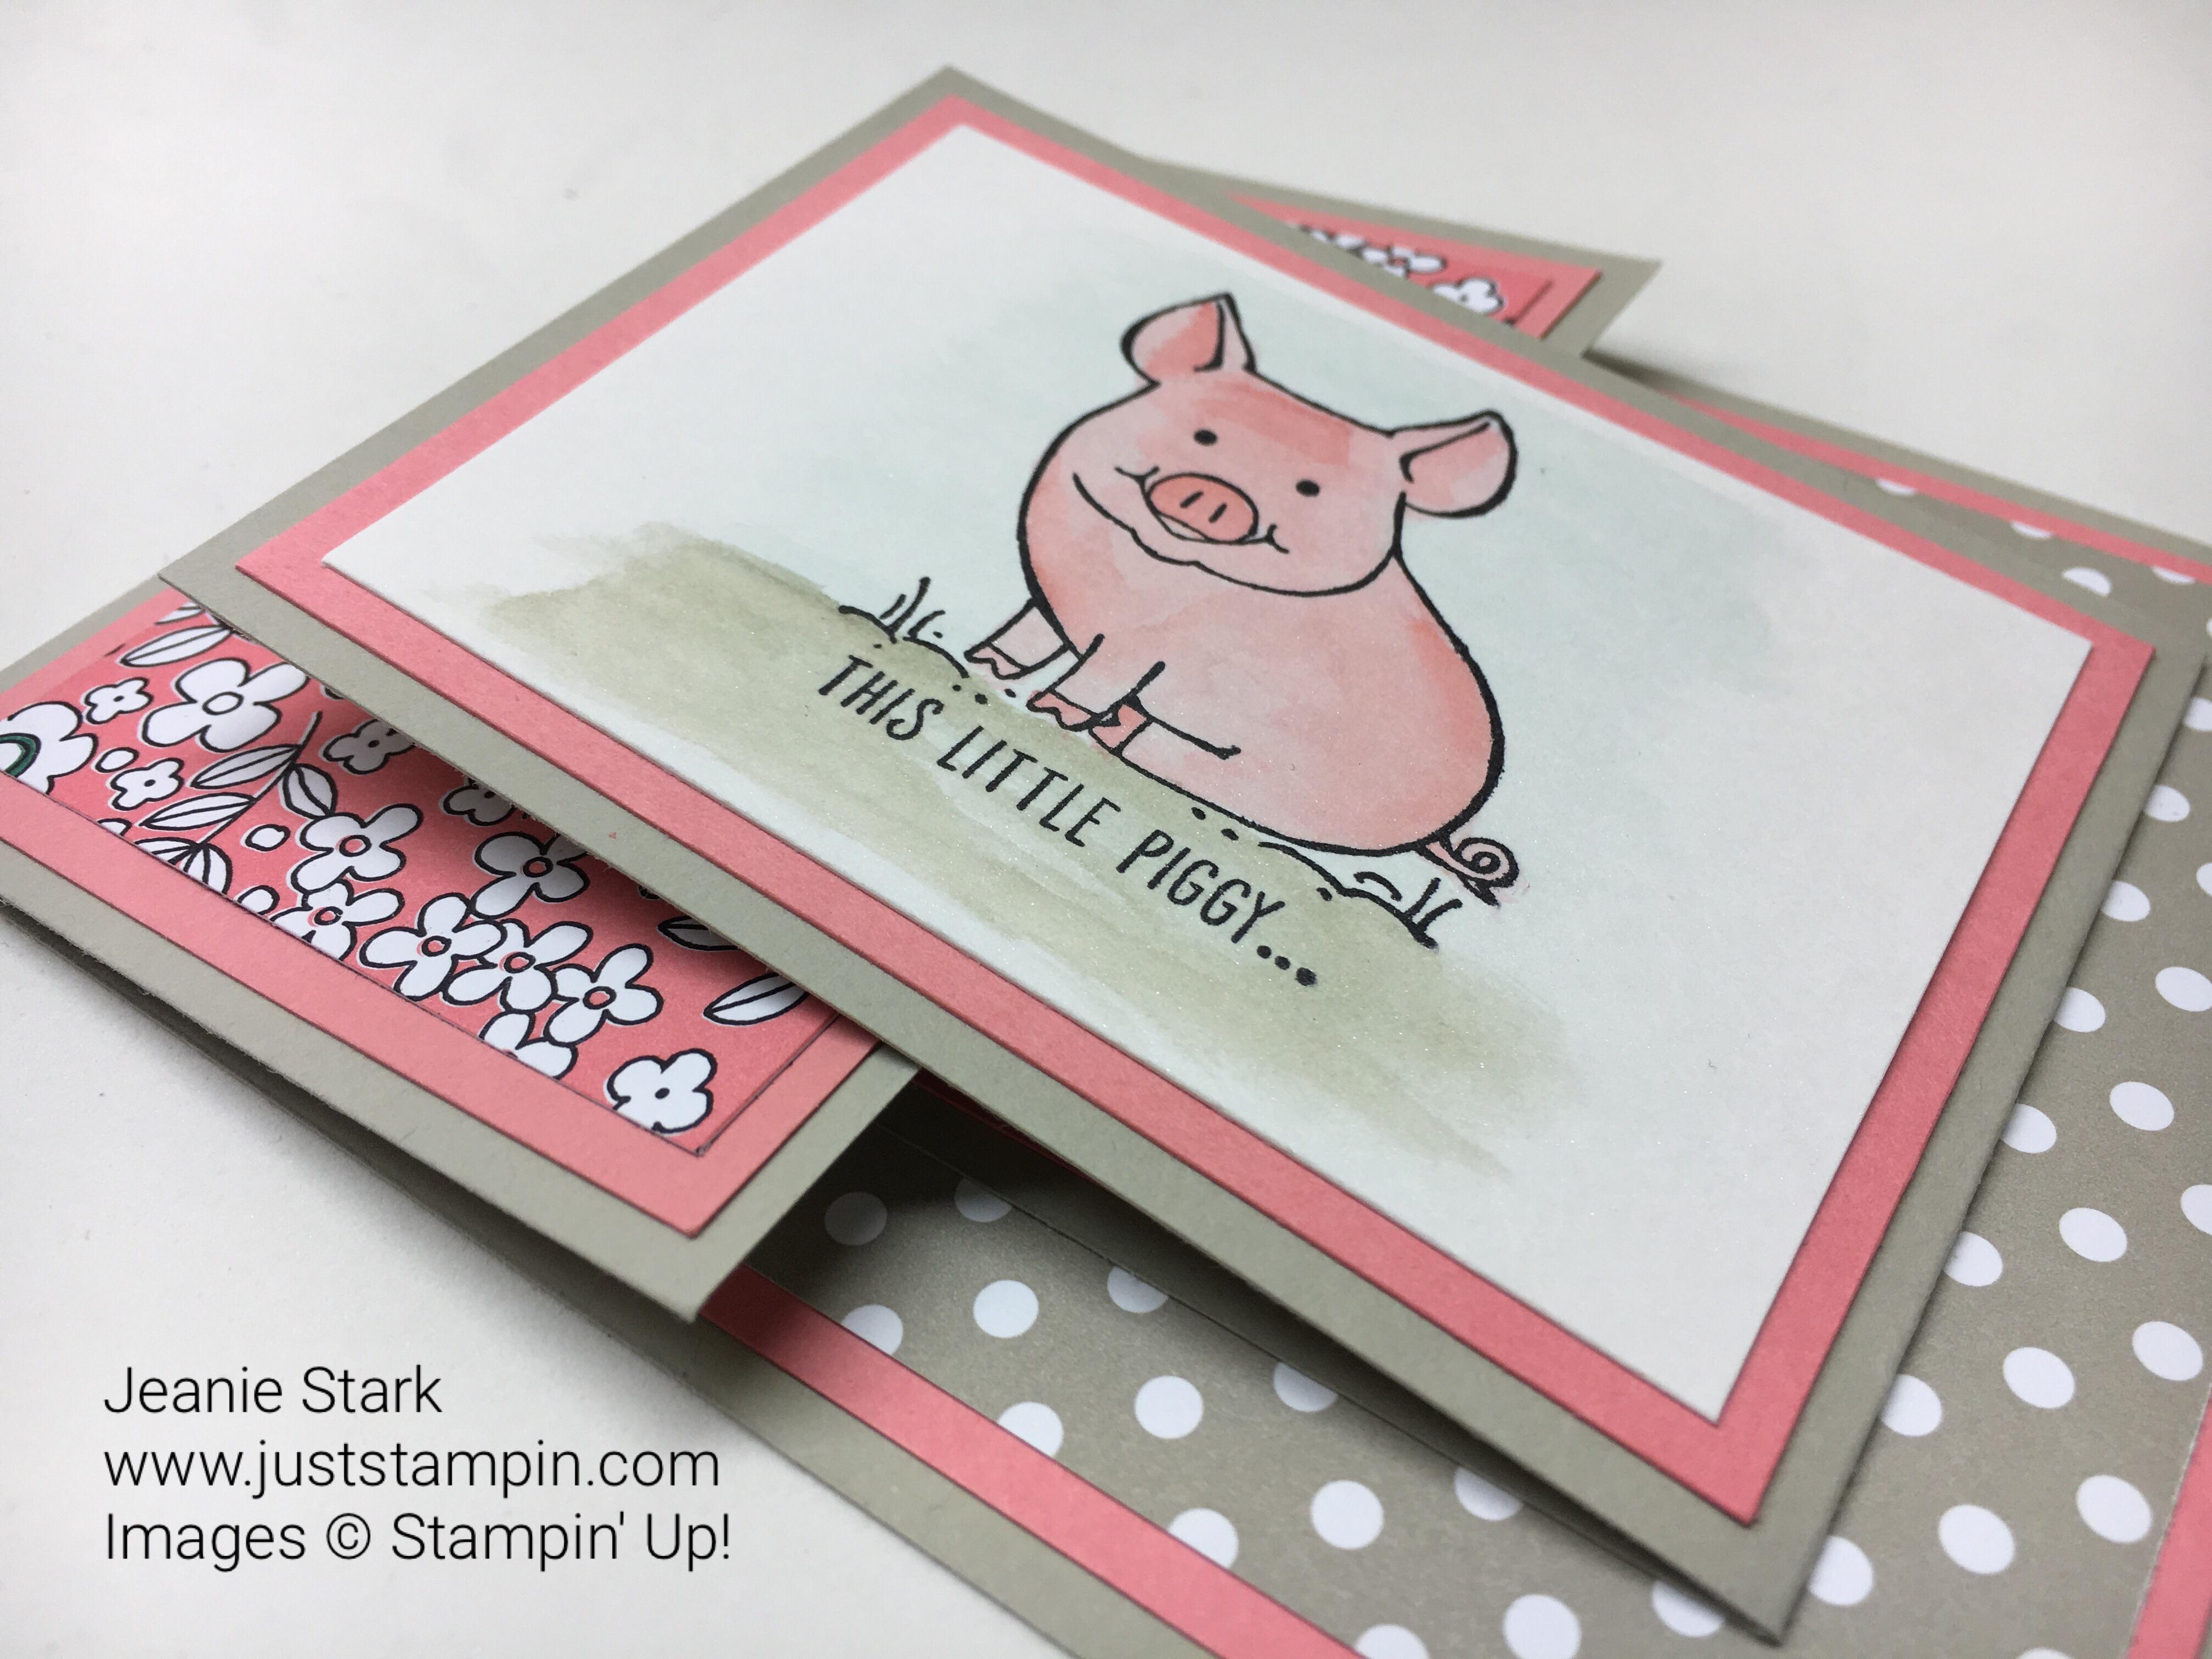 Stampin Up This Little Piggy fun fold card idea - Jeanie Stark StampinUp